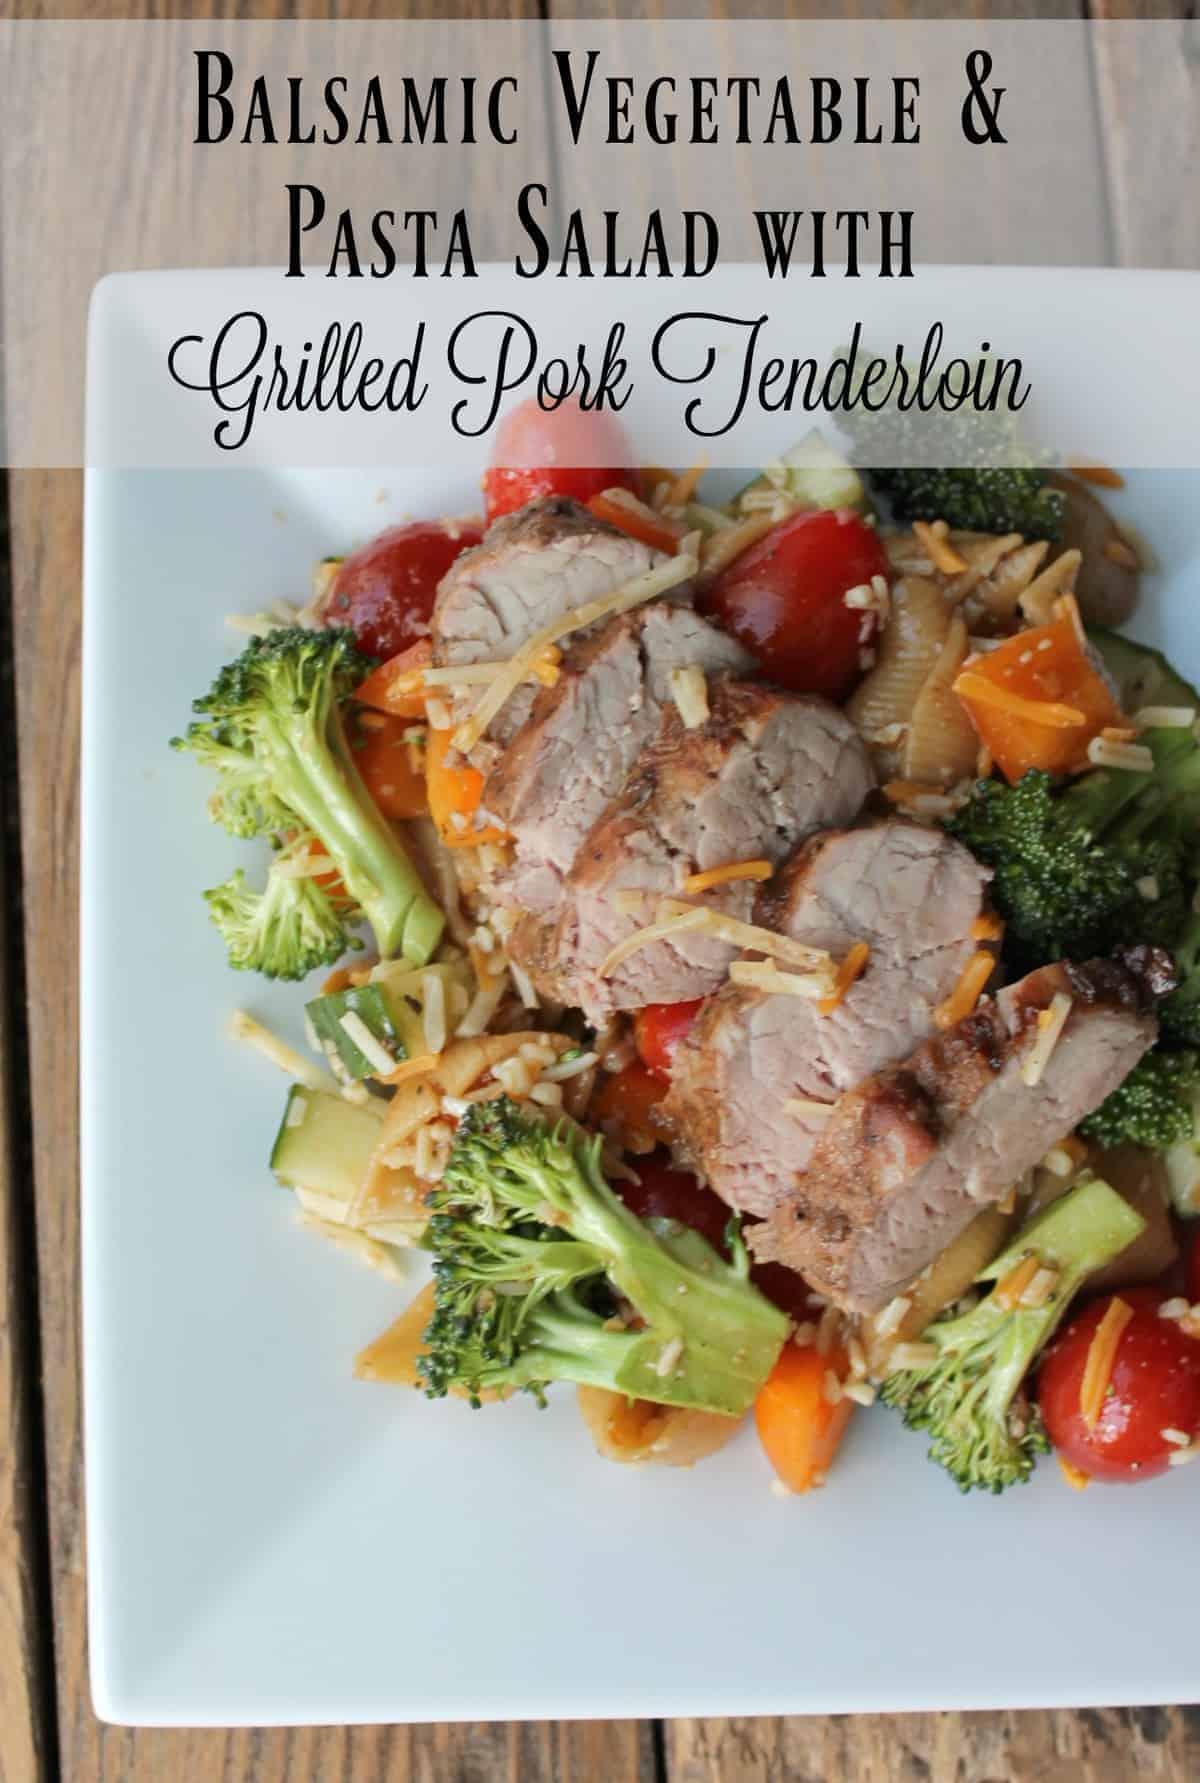 Balsamic Vegetable & Pasta Salad with Grilled Pork Tenderloin